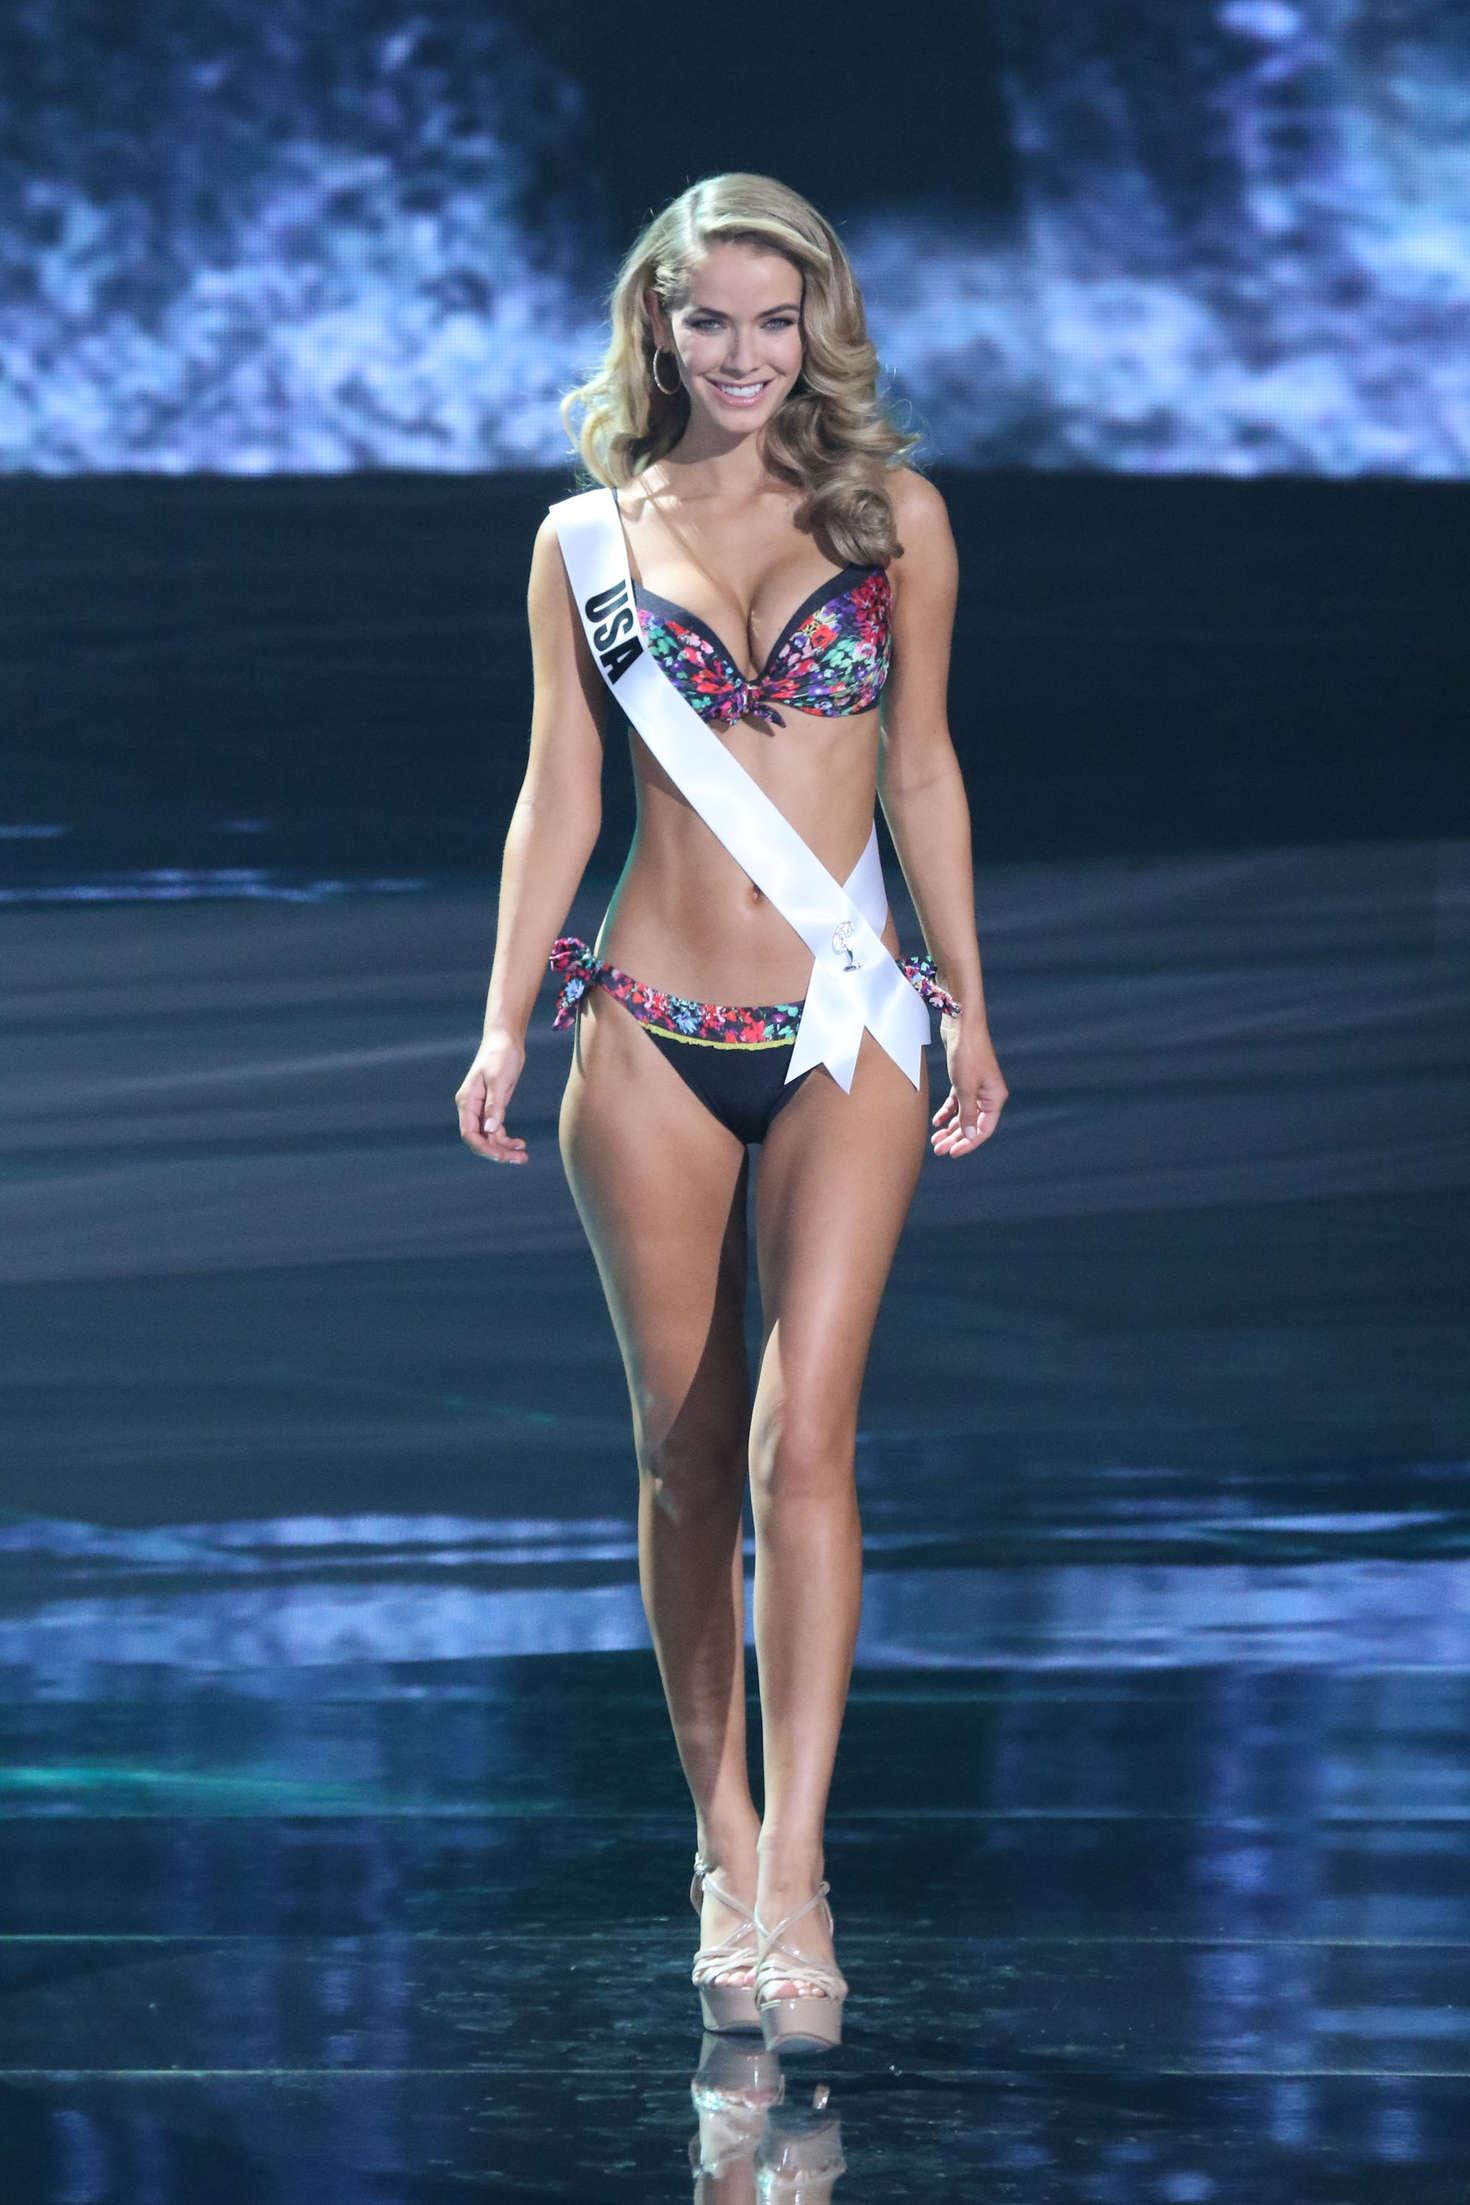 Olivia Jordan Miss Universe Premlinary Round in Las Vegas